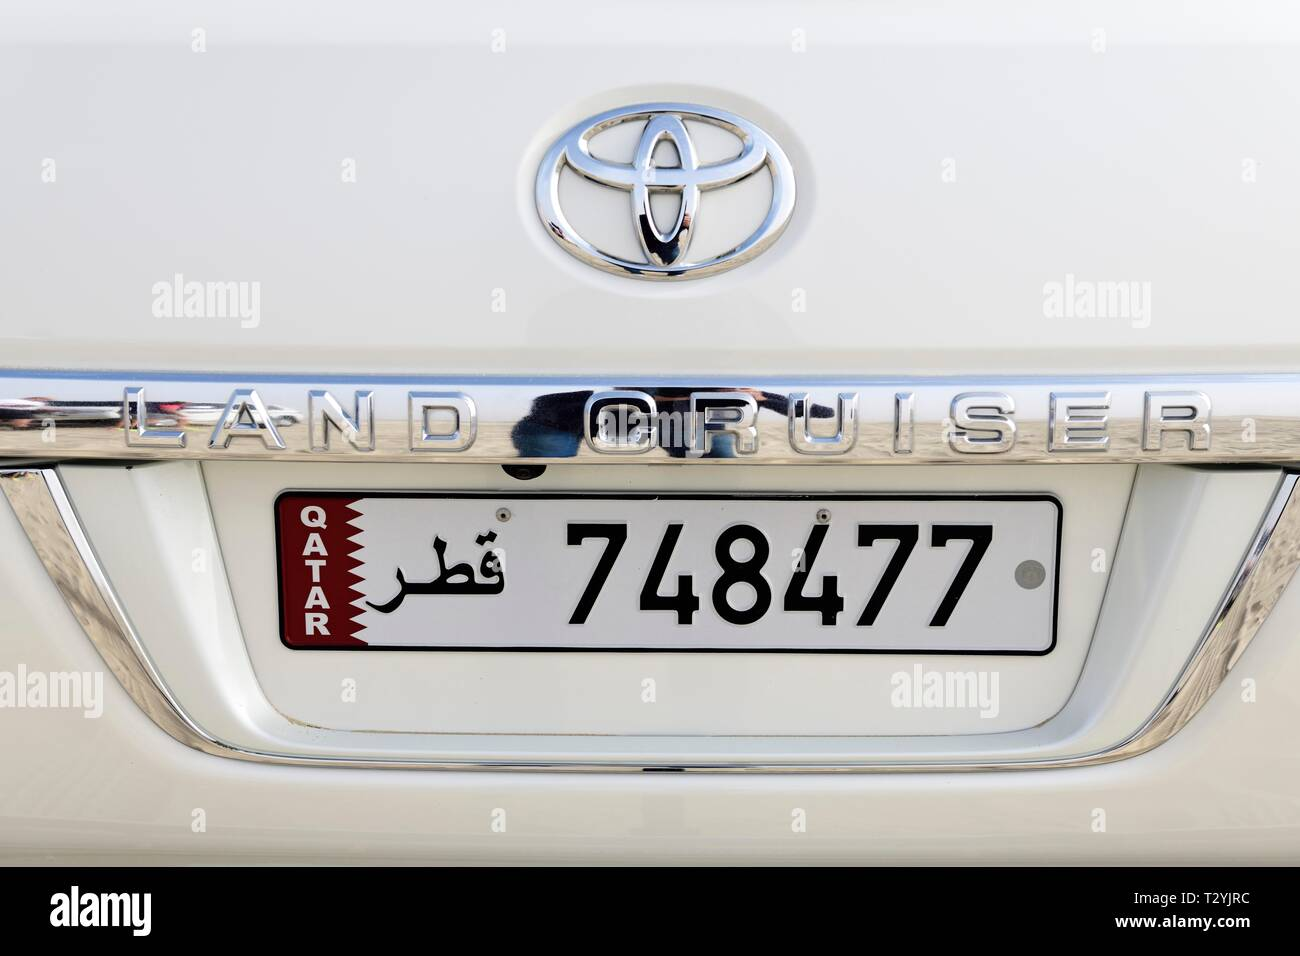 Toyota Landcruiser with arabic registration plate of Qatar, Doha, Qatar - Stock Image